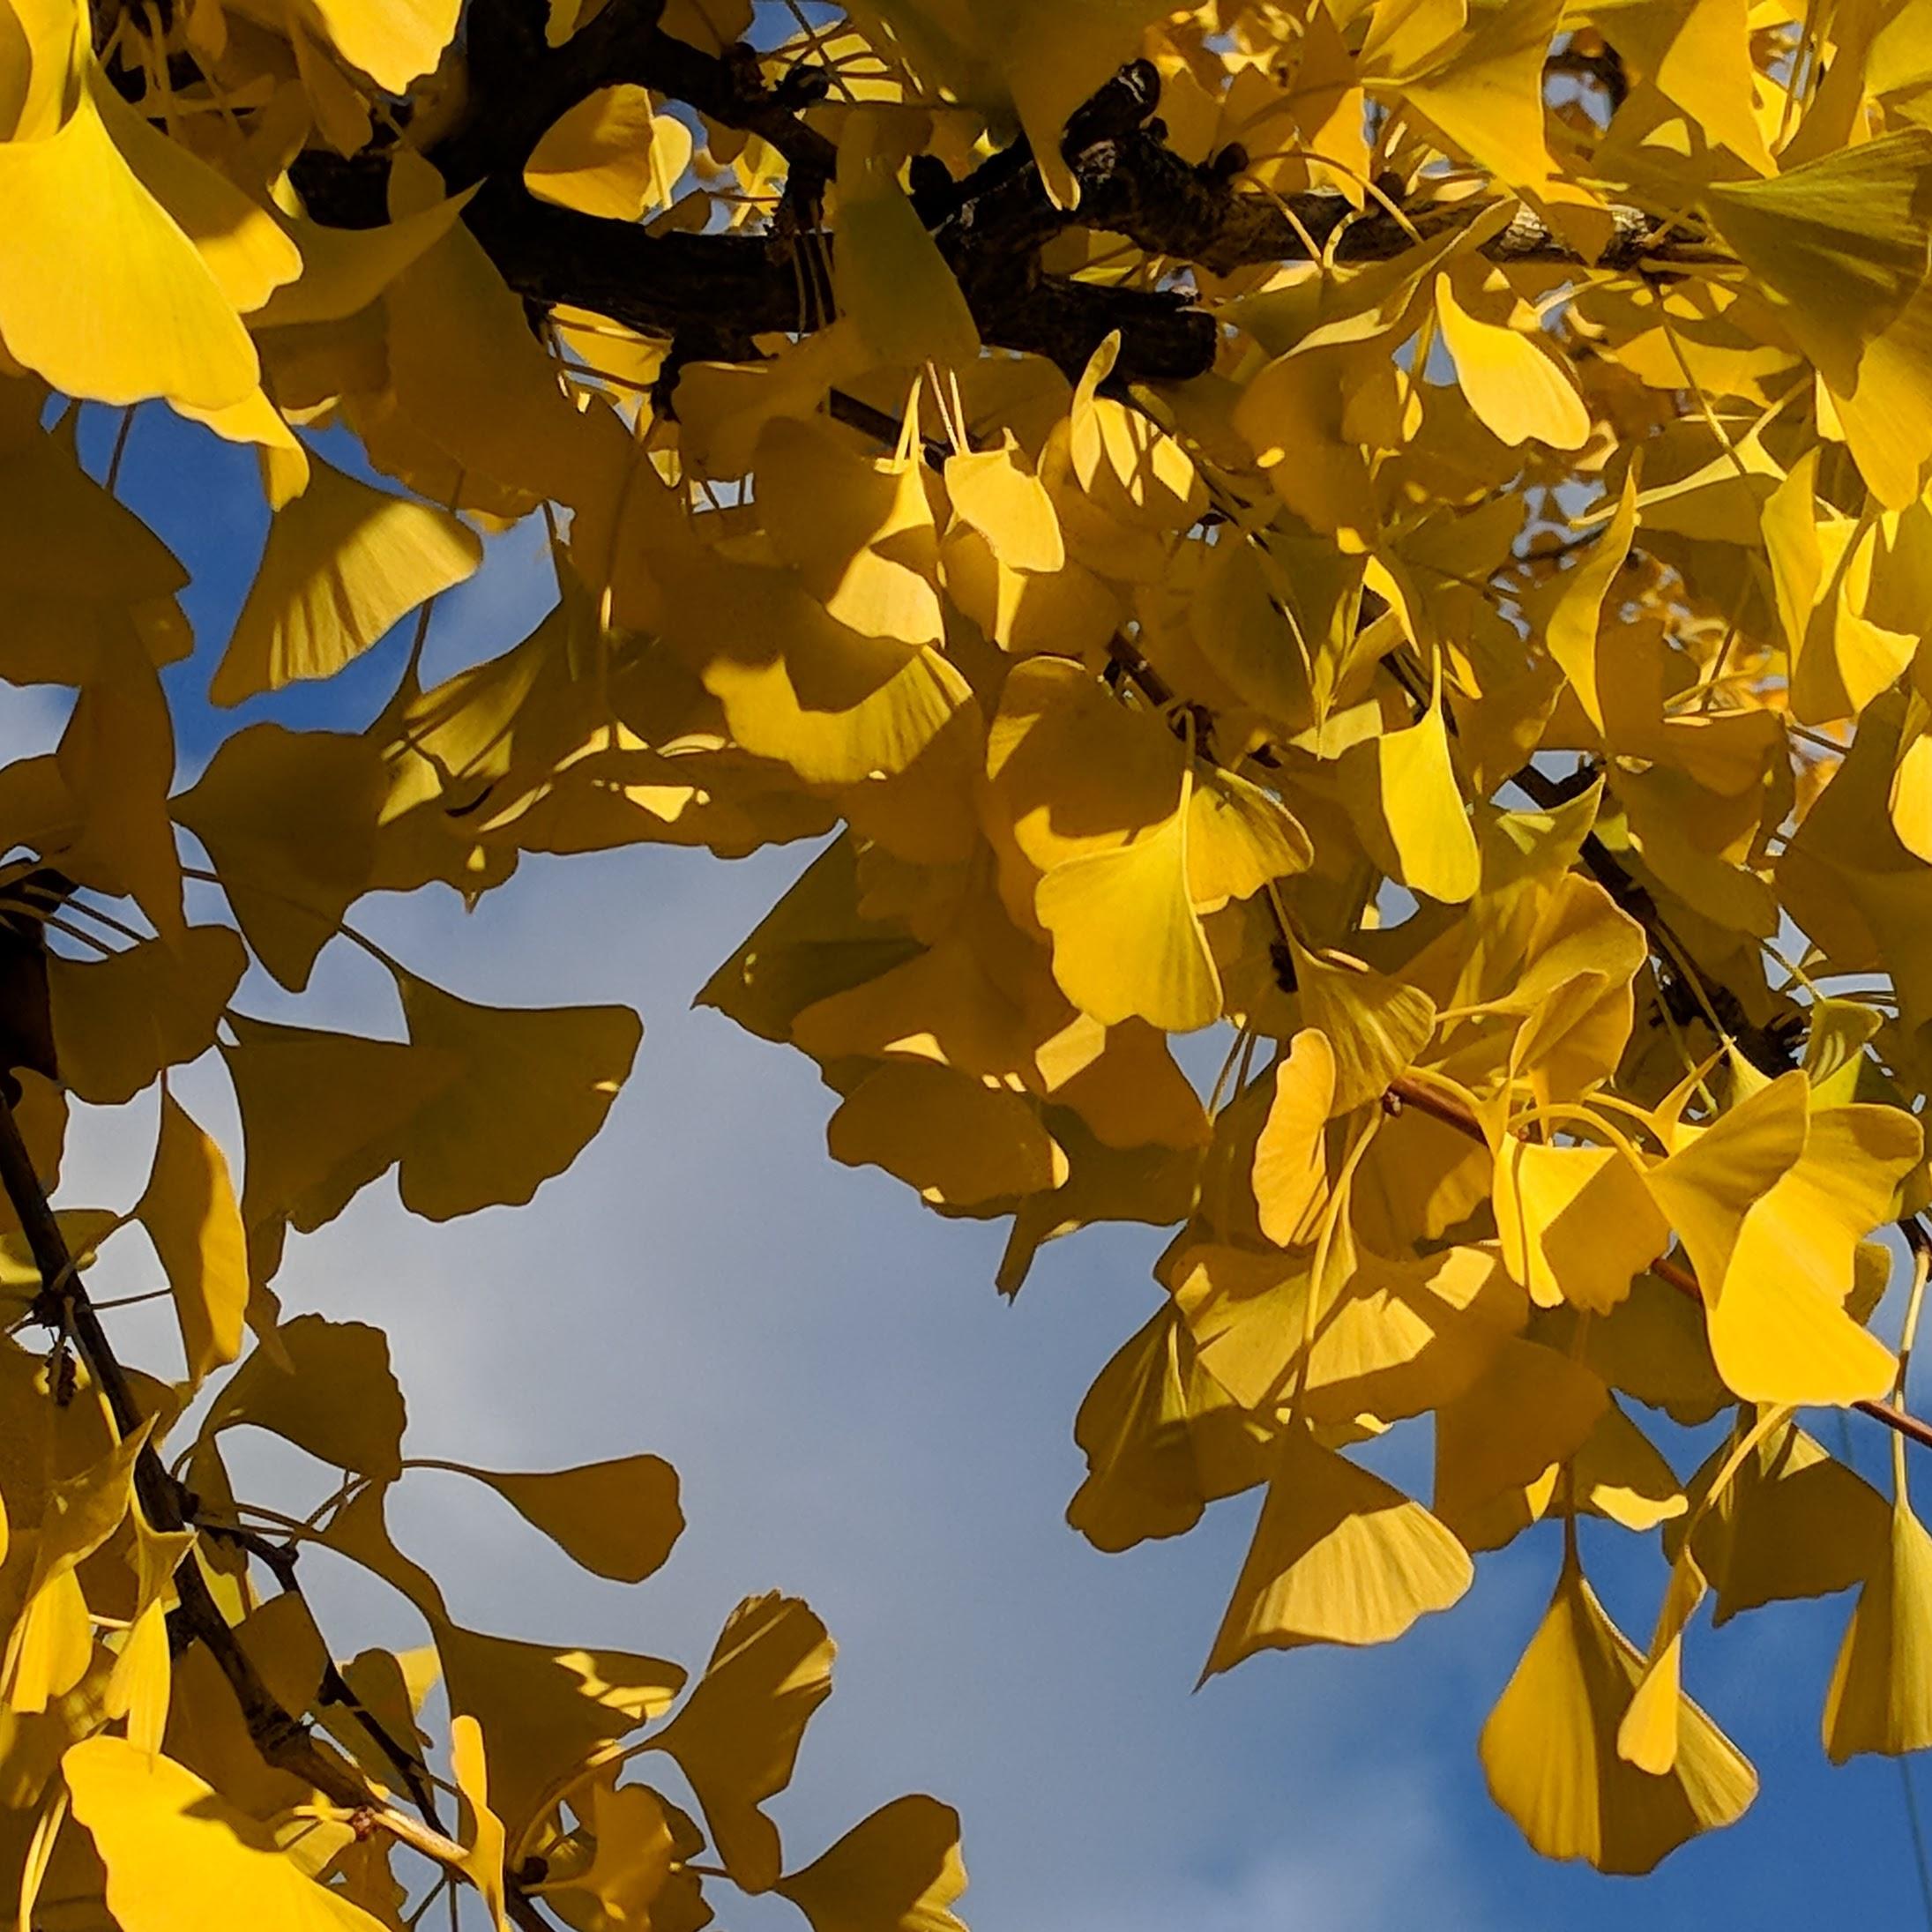 Colors of the season - Fall Gloucester Cape Ann ©c ryan_20181025